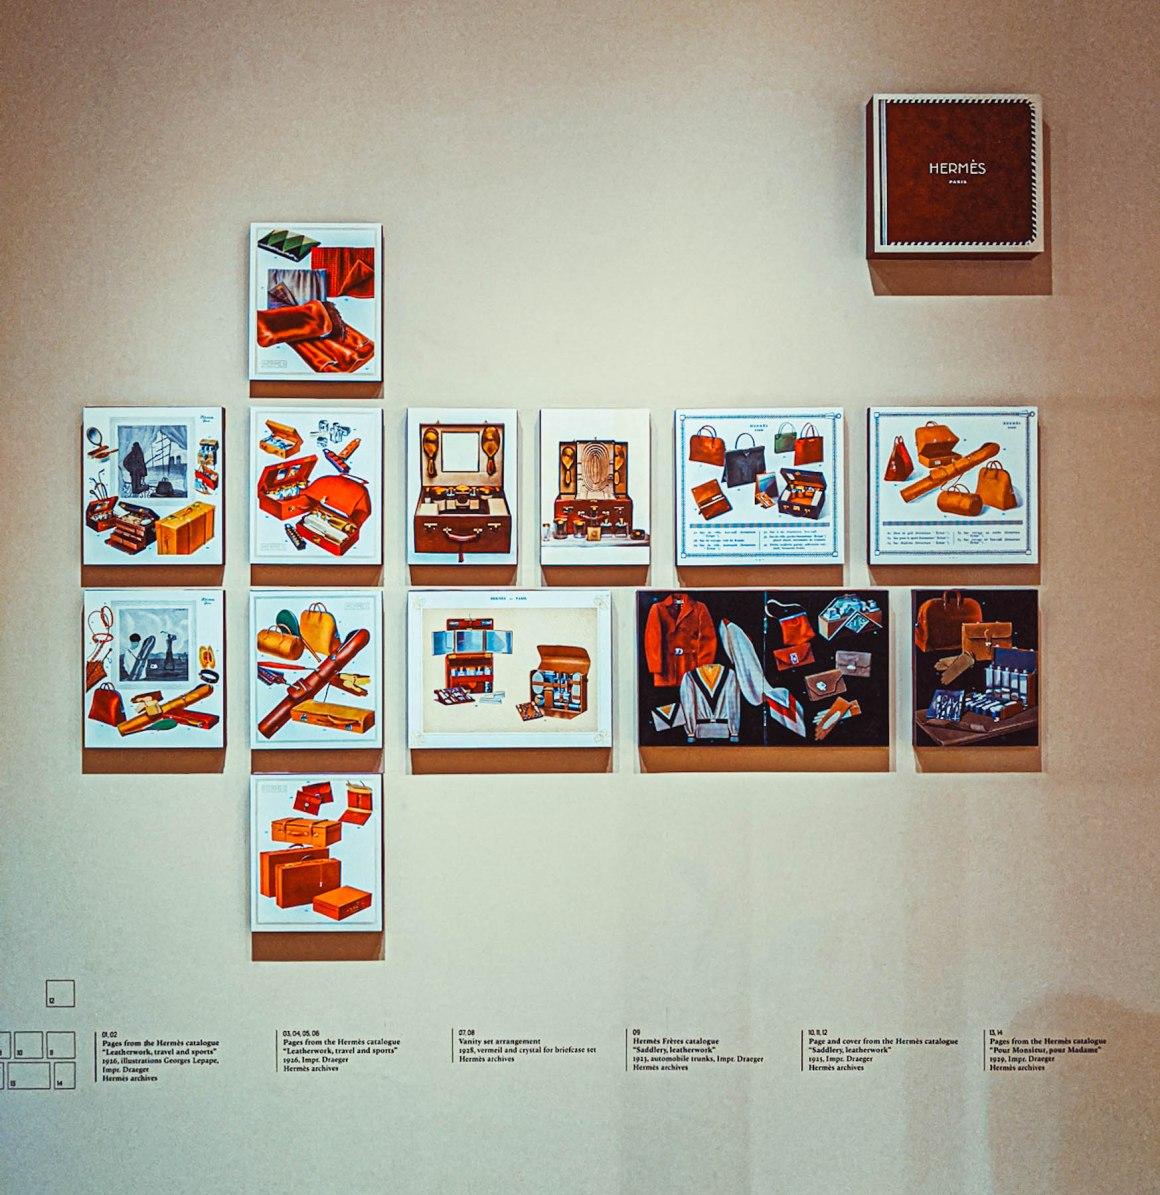 Hermès Heritage, Rouges Hermès, Naina Redhu, Naina.co, EyesForLuxury, The Chanakyapuri, Hermès India, Hermès Exhibit, Hermès Vintage, Hermès Objects, Red Objects, History, France, French Luxury Brand, New Delhi, Luxury Brand, Photographer, Blogger, Experience Collector